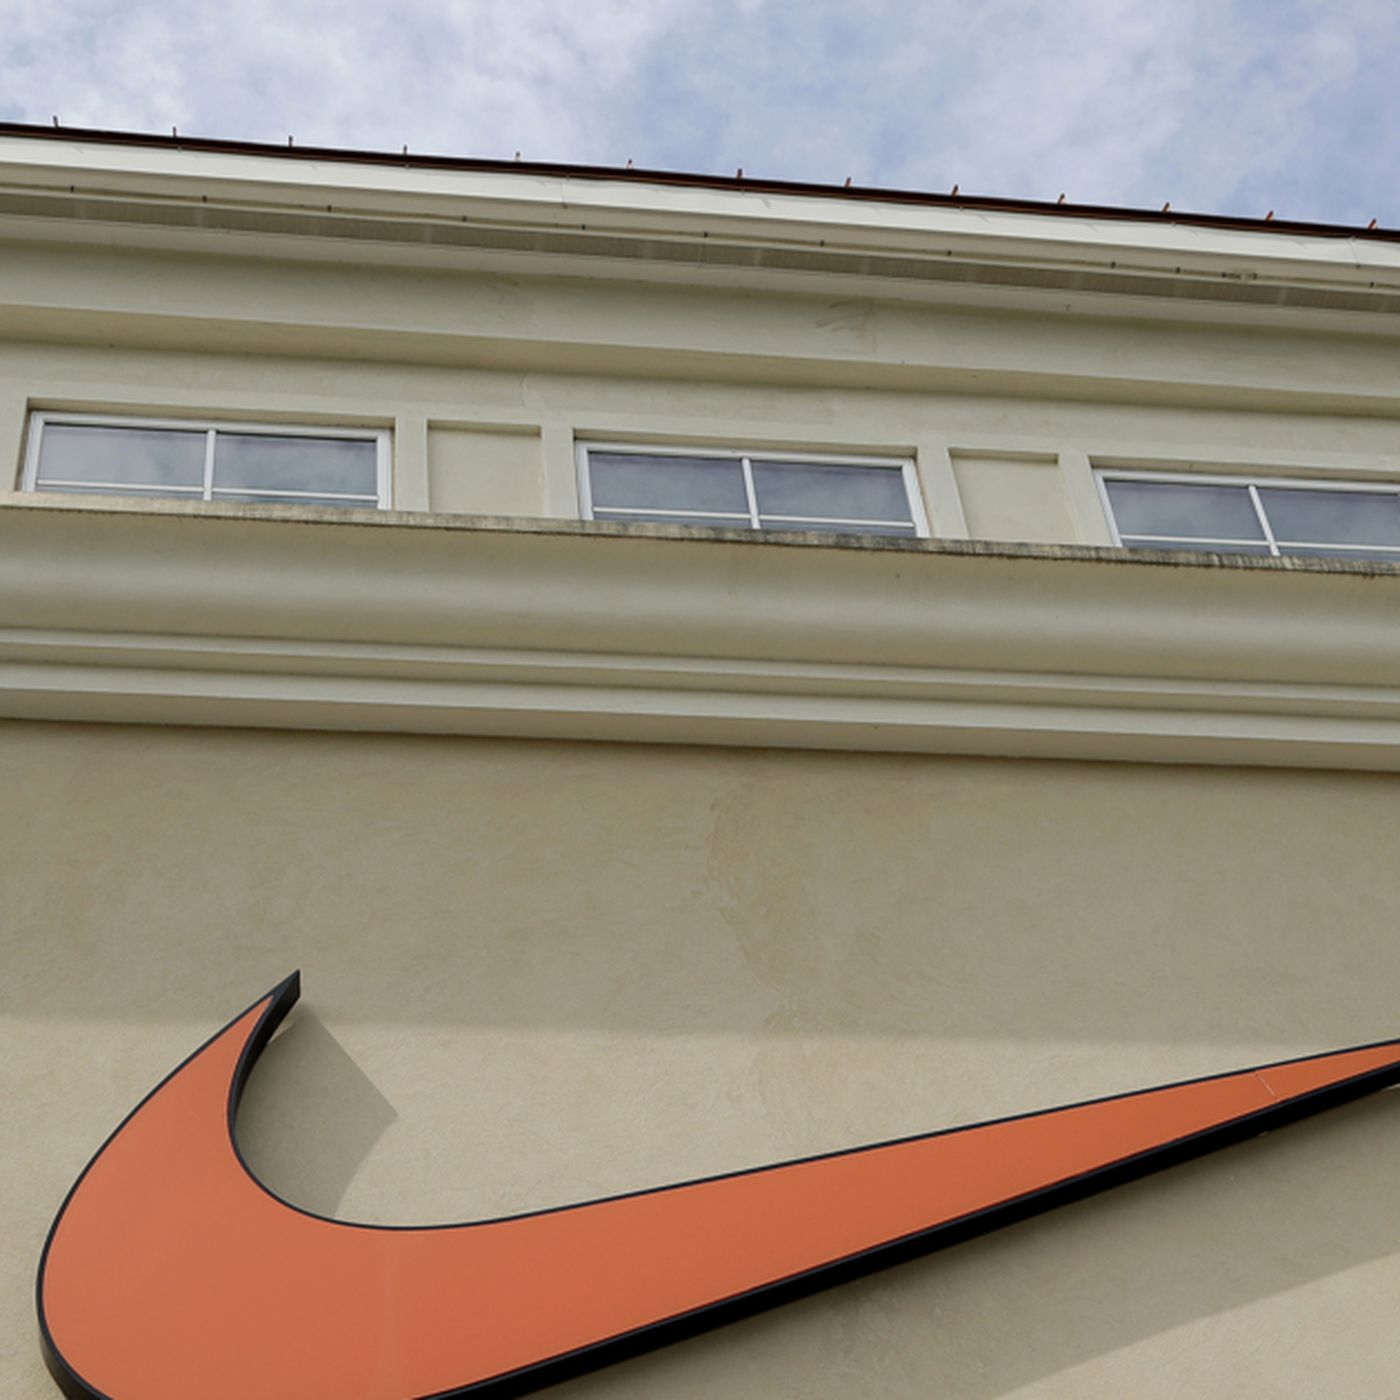 Nike Air Max 270 criticized by Muslims over Arabic script